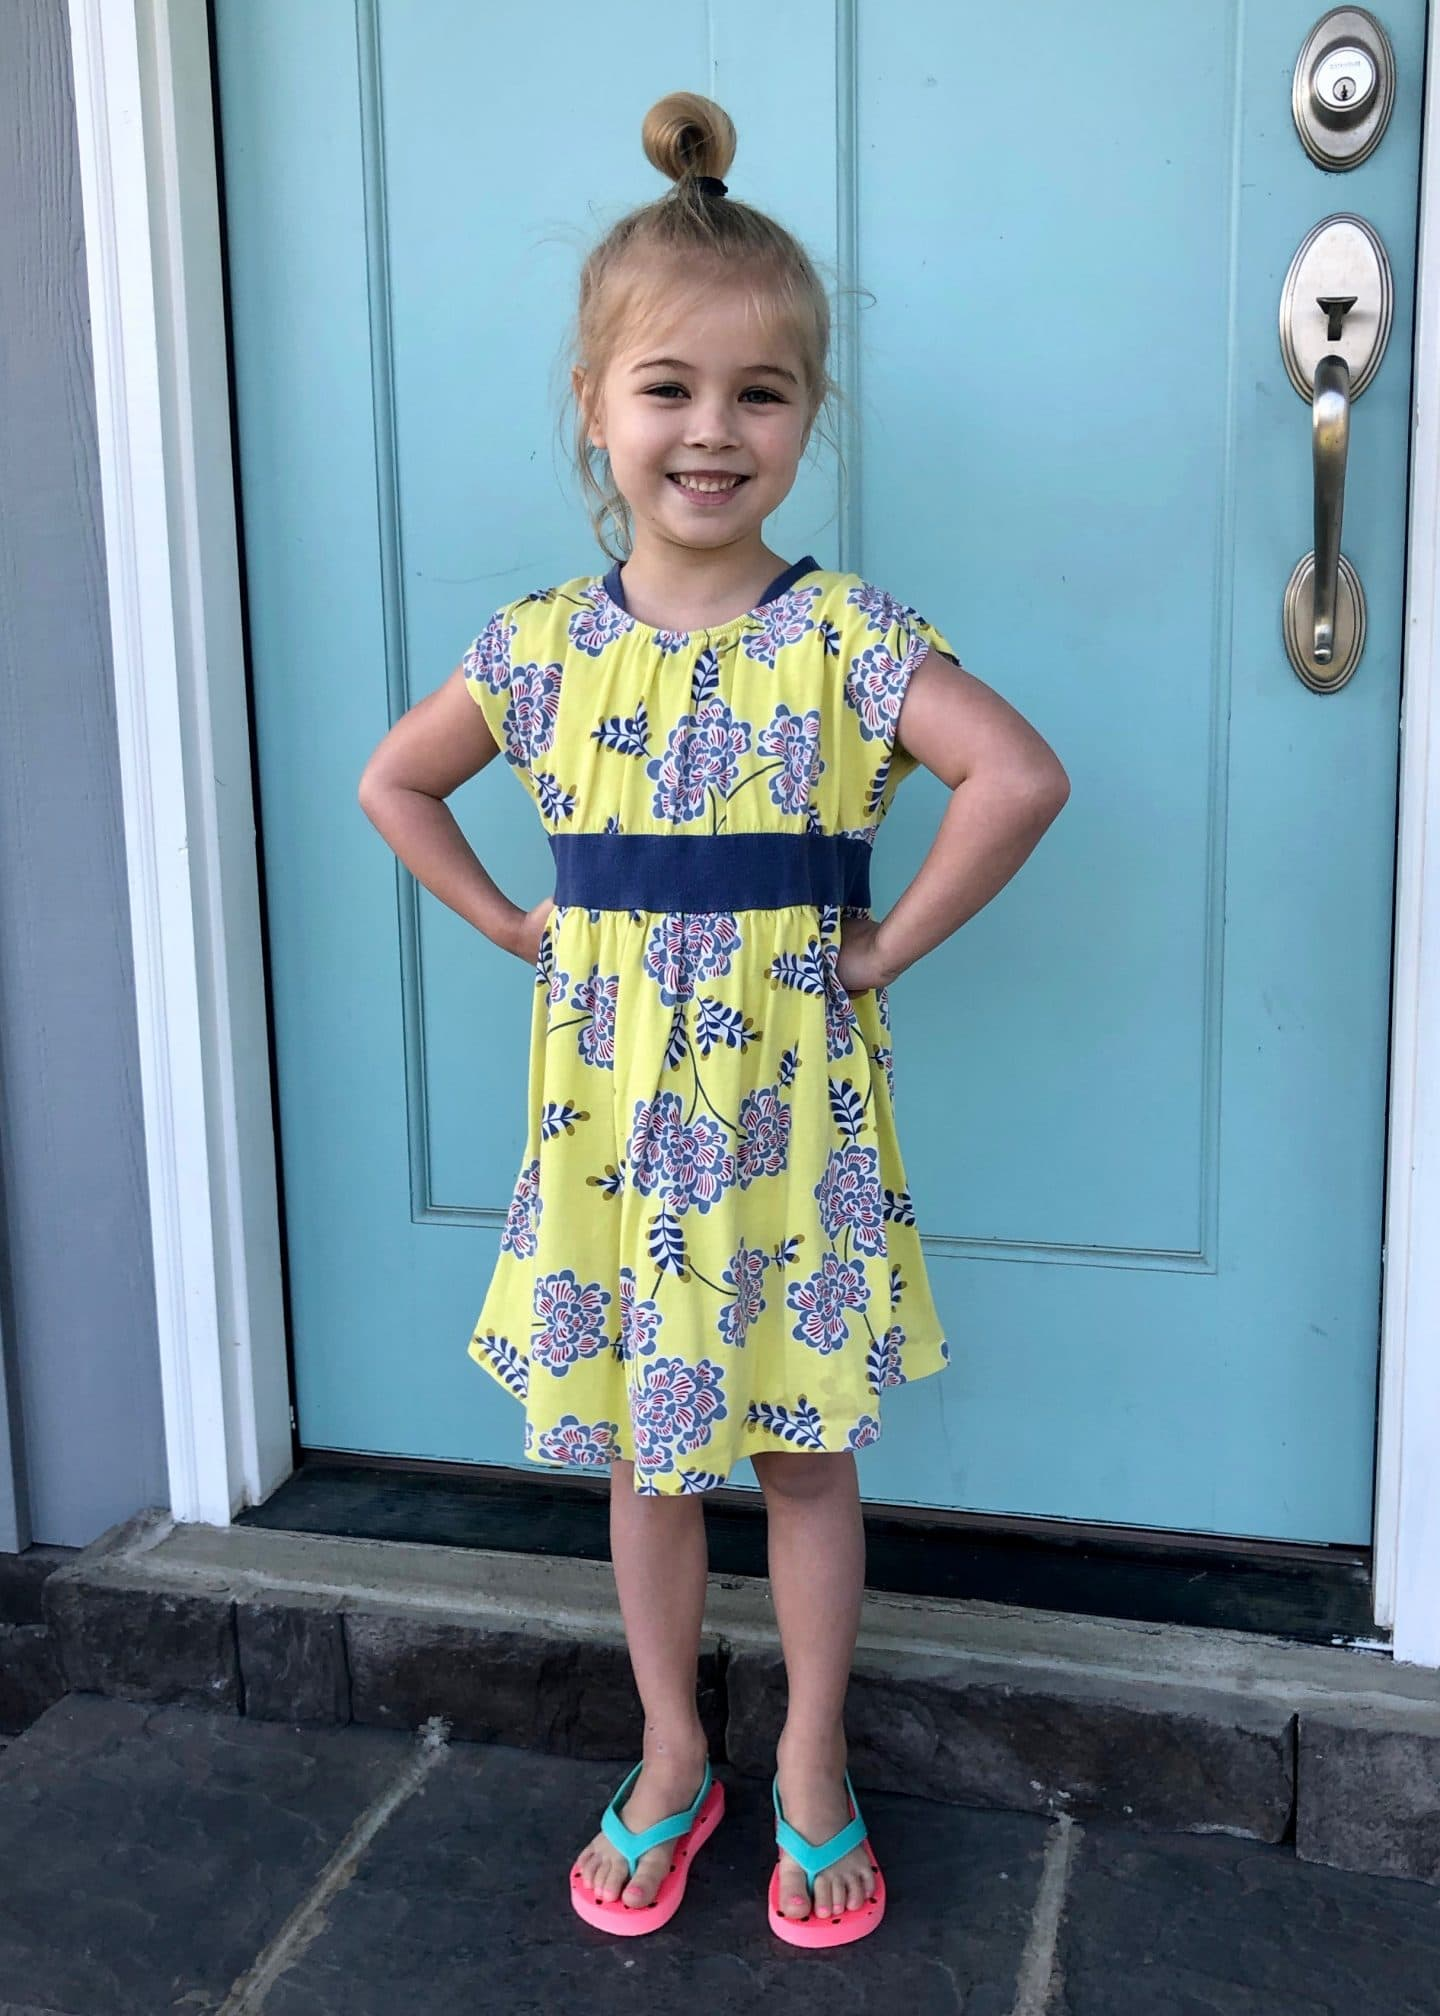 Tess last day of preschool